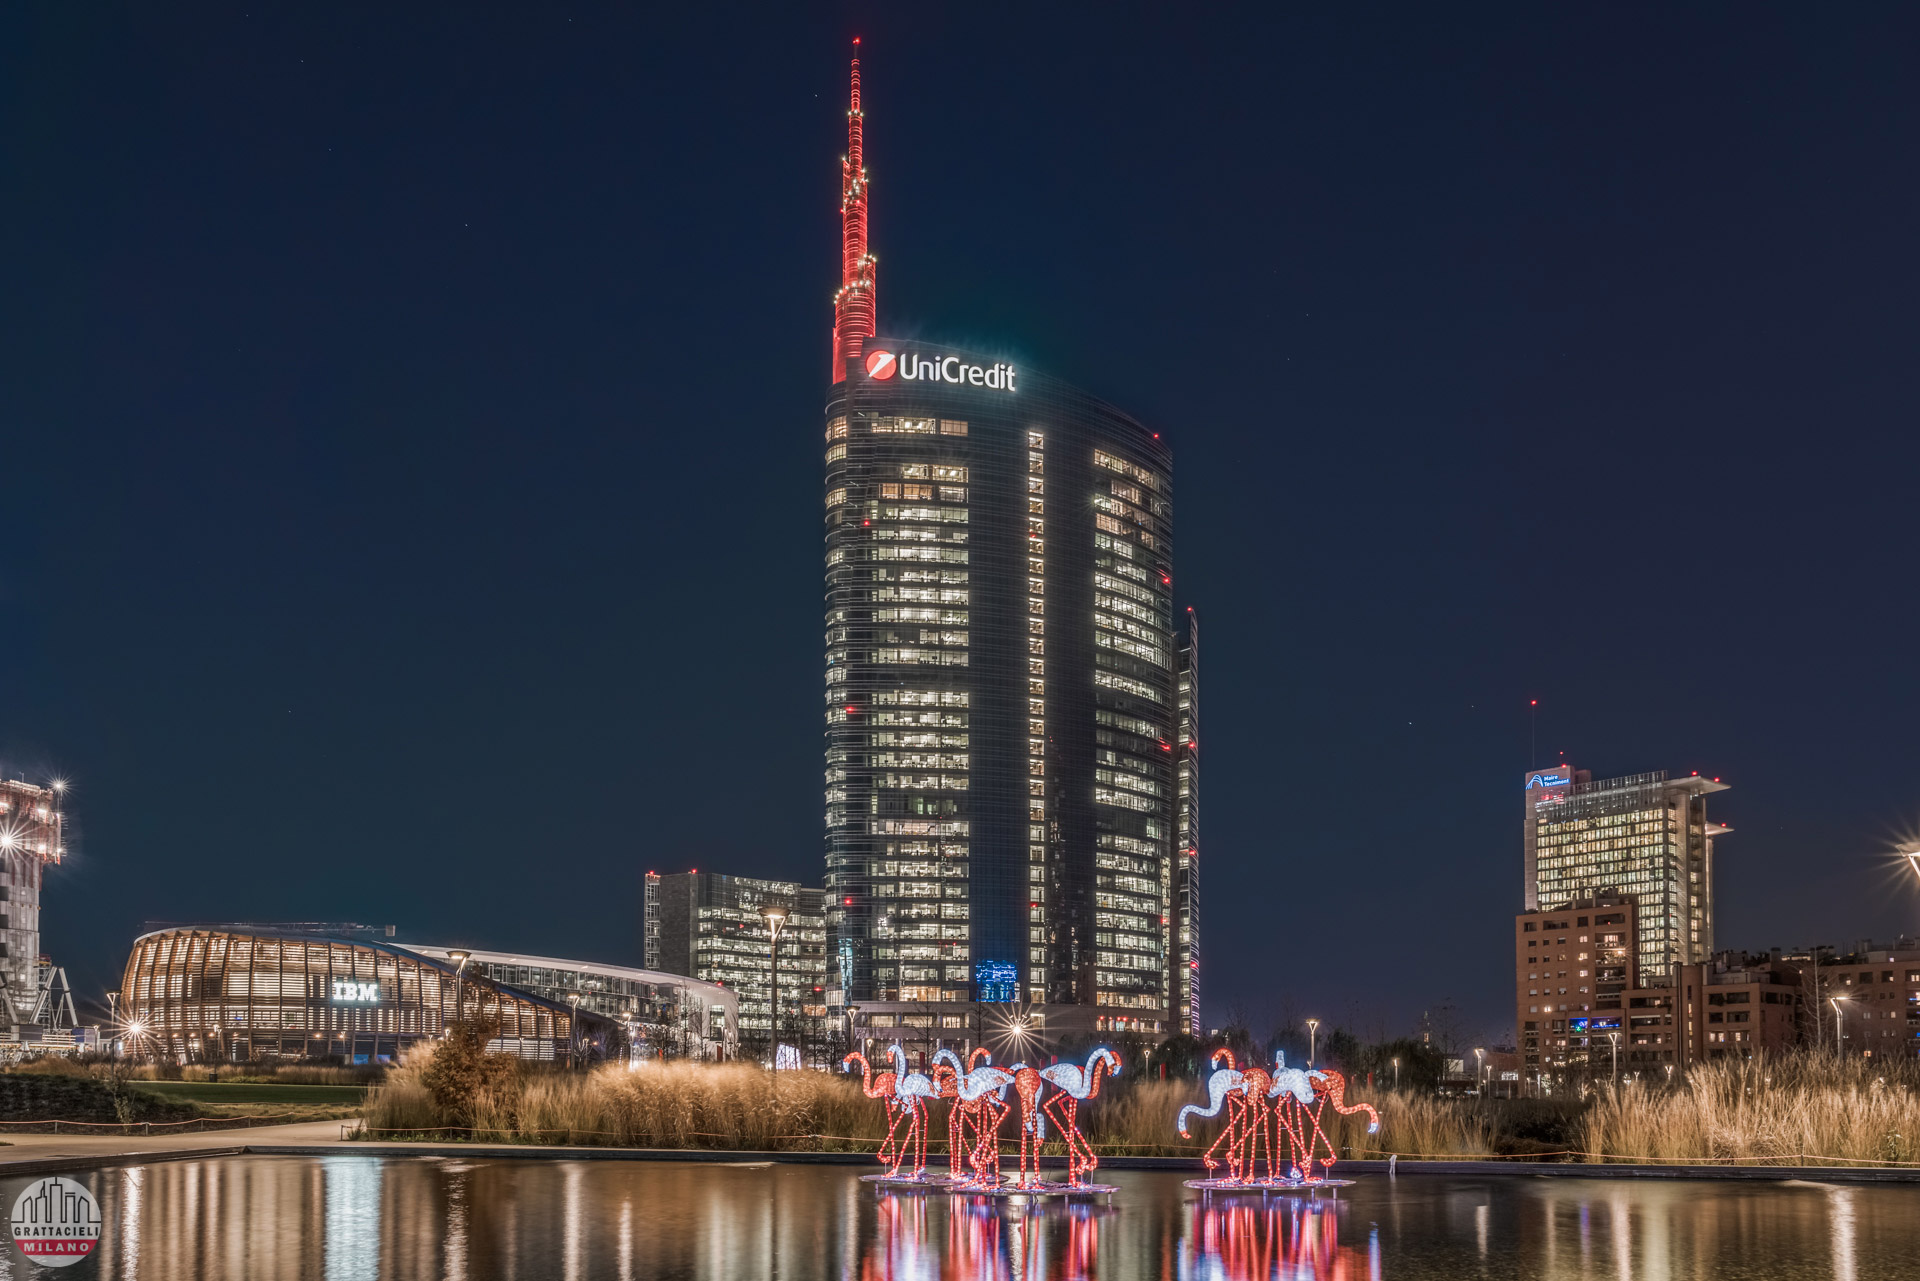 Unicredit Tower. ©2019 Roberto Bellini